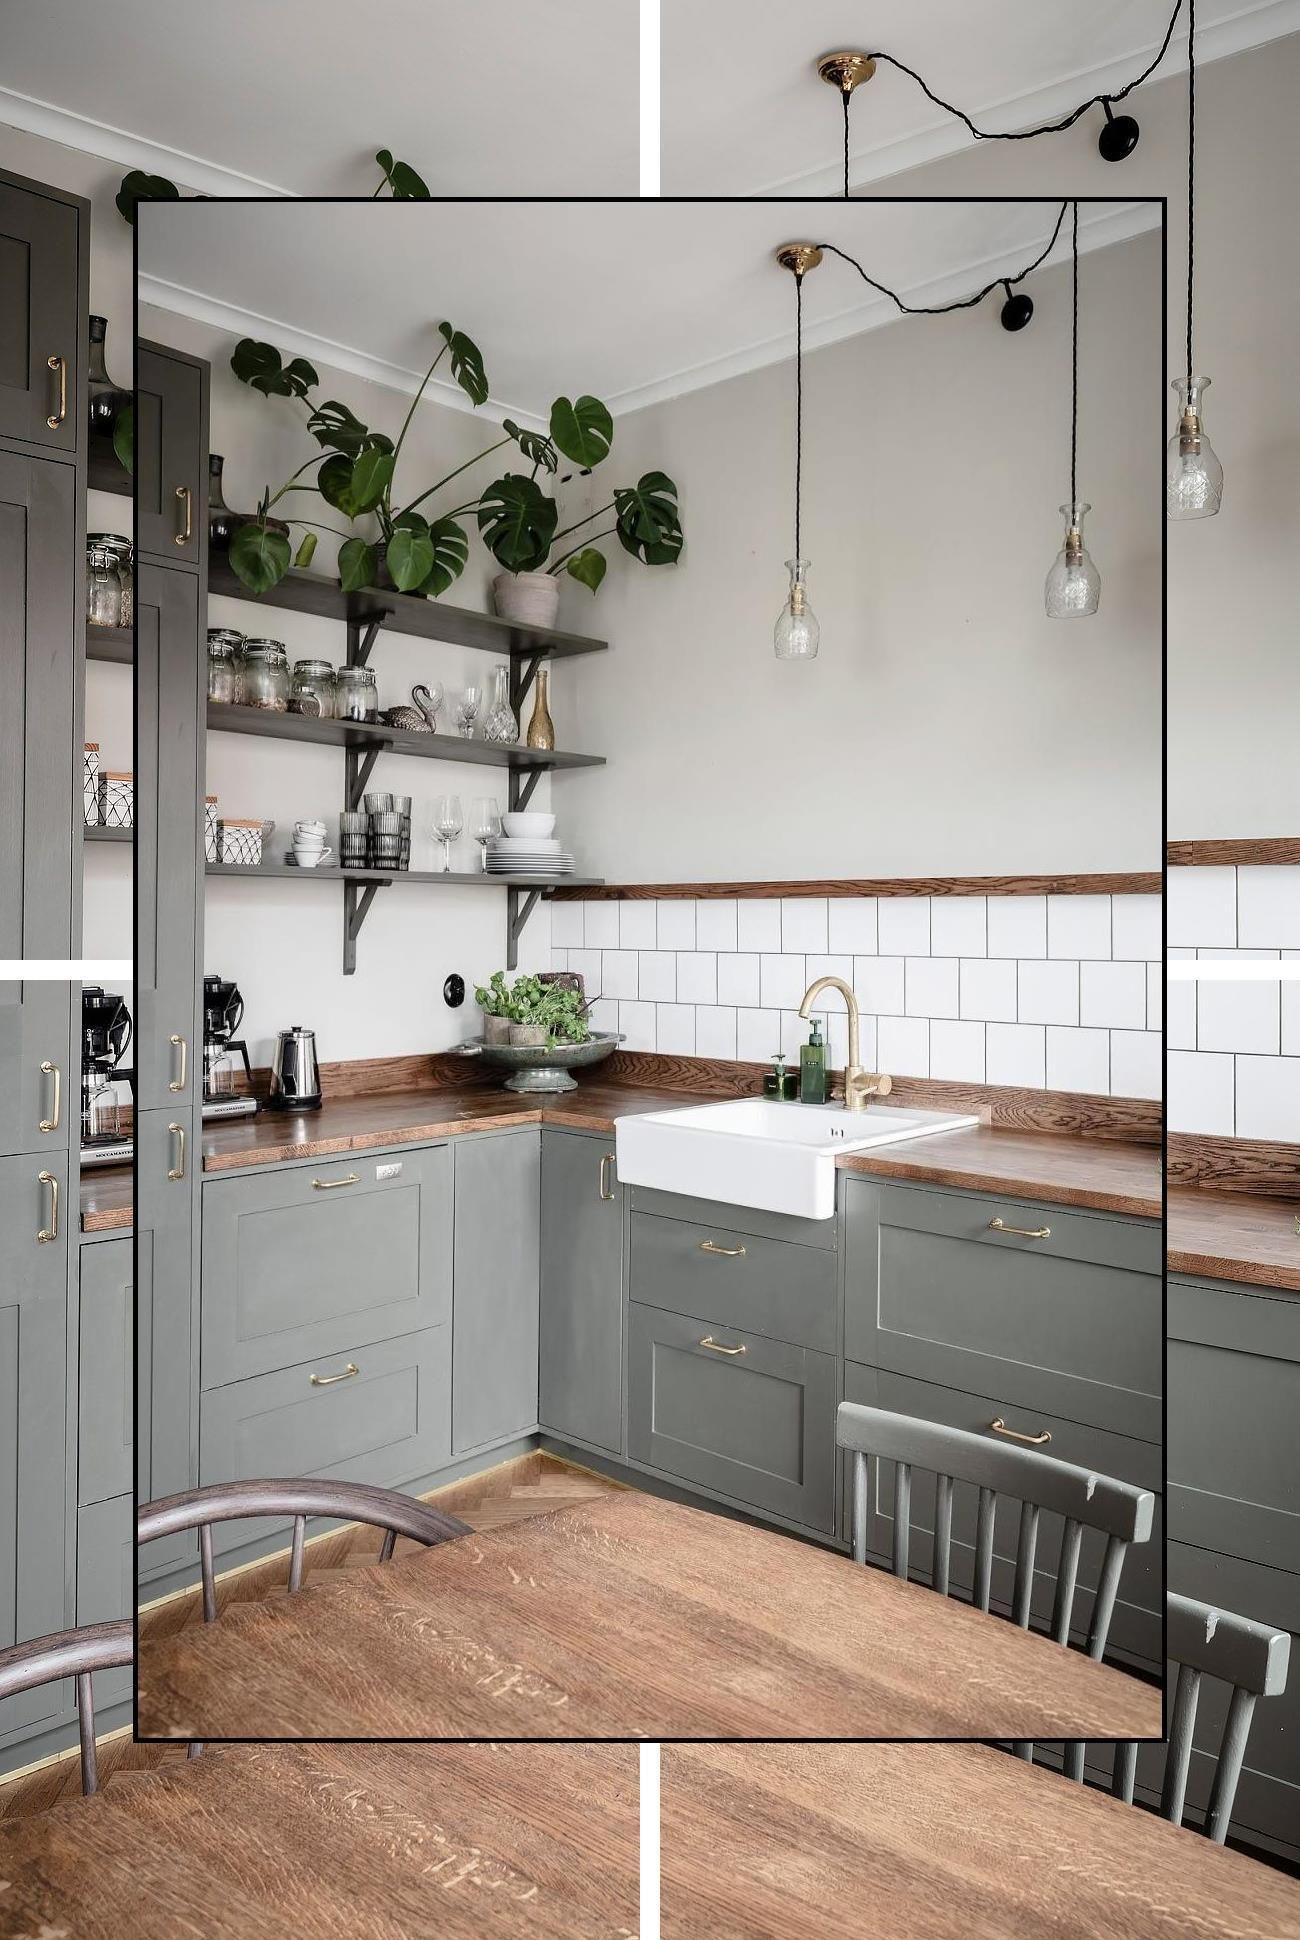 Model Kitchen Kitchen Accents And Decor Country Kitchen Decor For Sale Interior Design Kitchen Home Decor Kitchen Kitchen Design